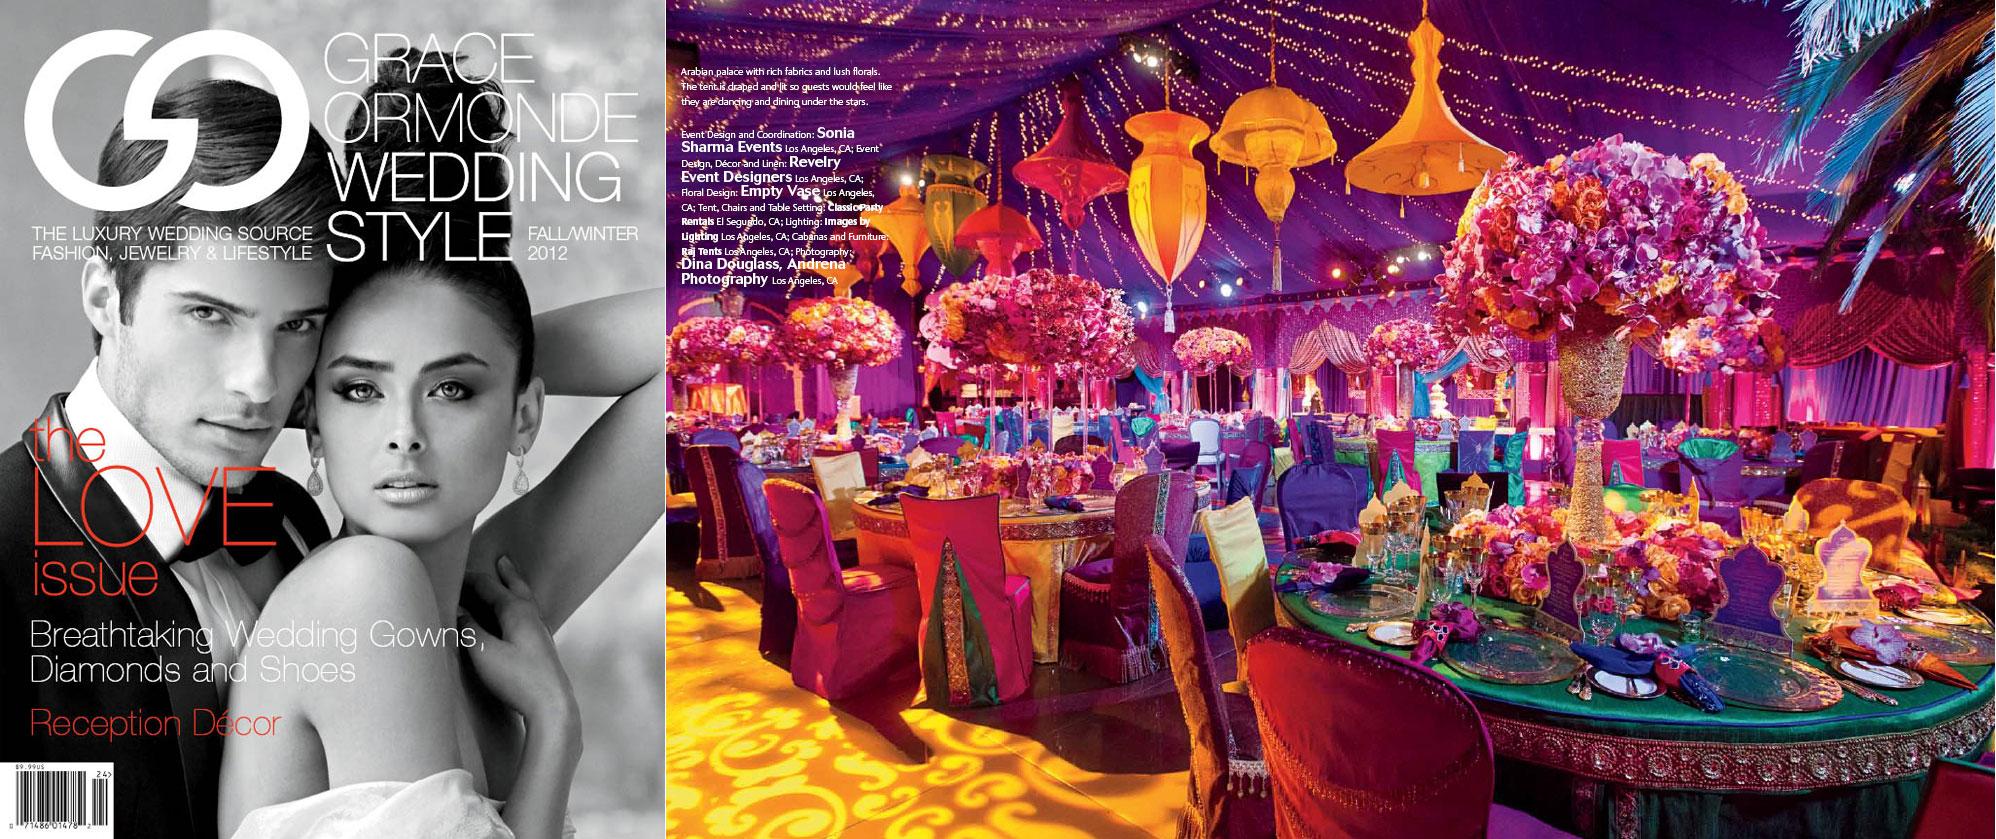 raj-tents-grace-ormond-2012-table-top-feature.jpg